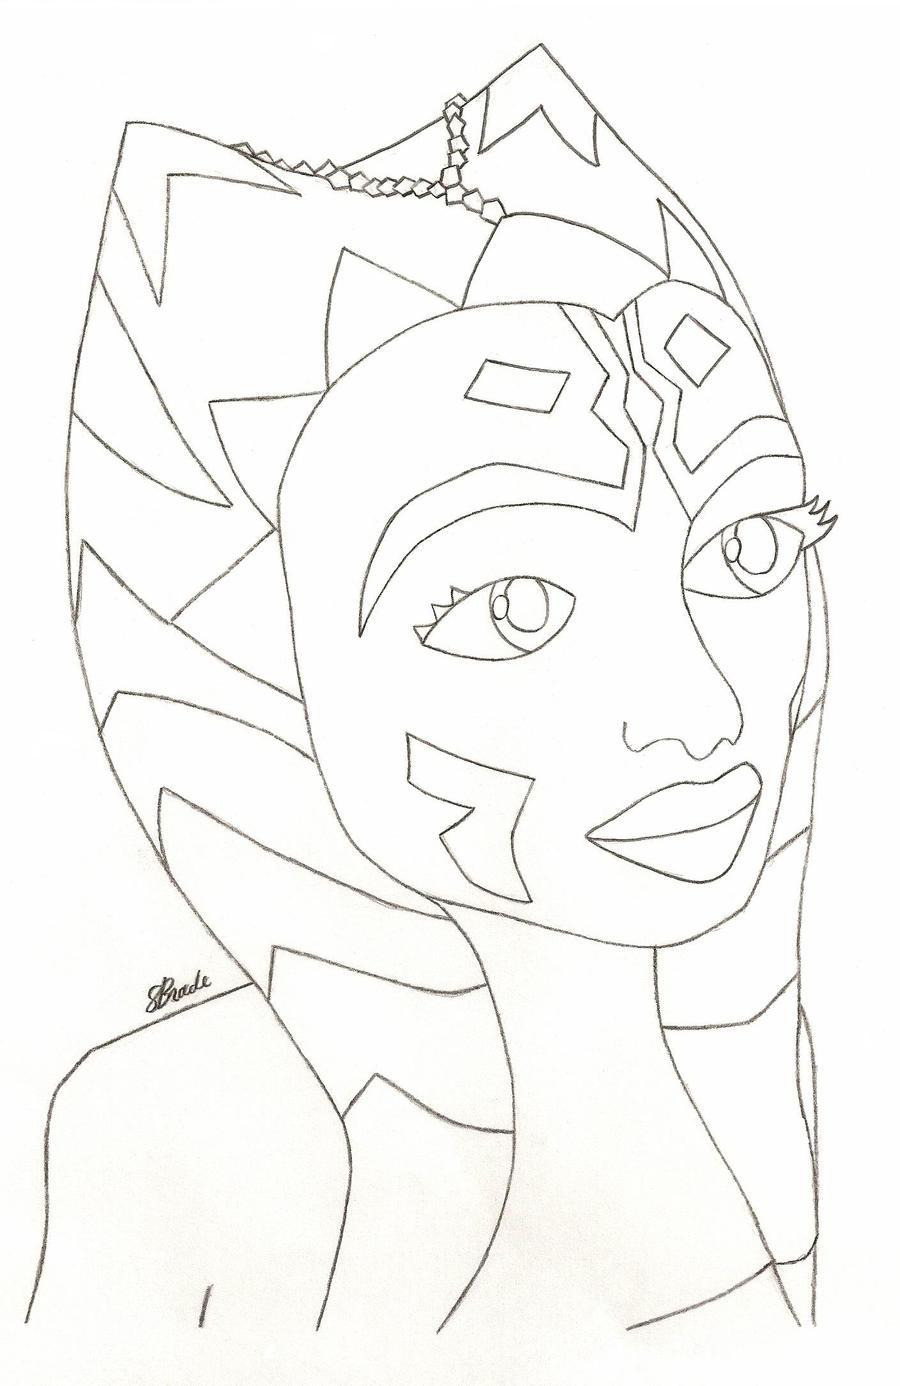 asoka coloring pages - photo#21